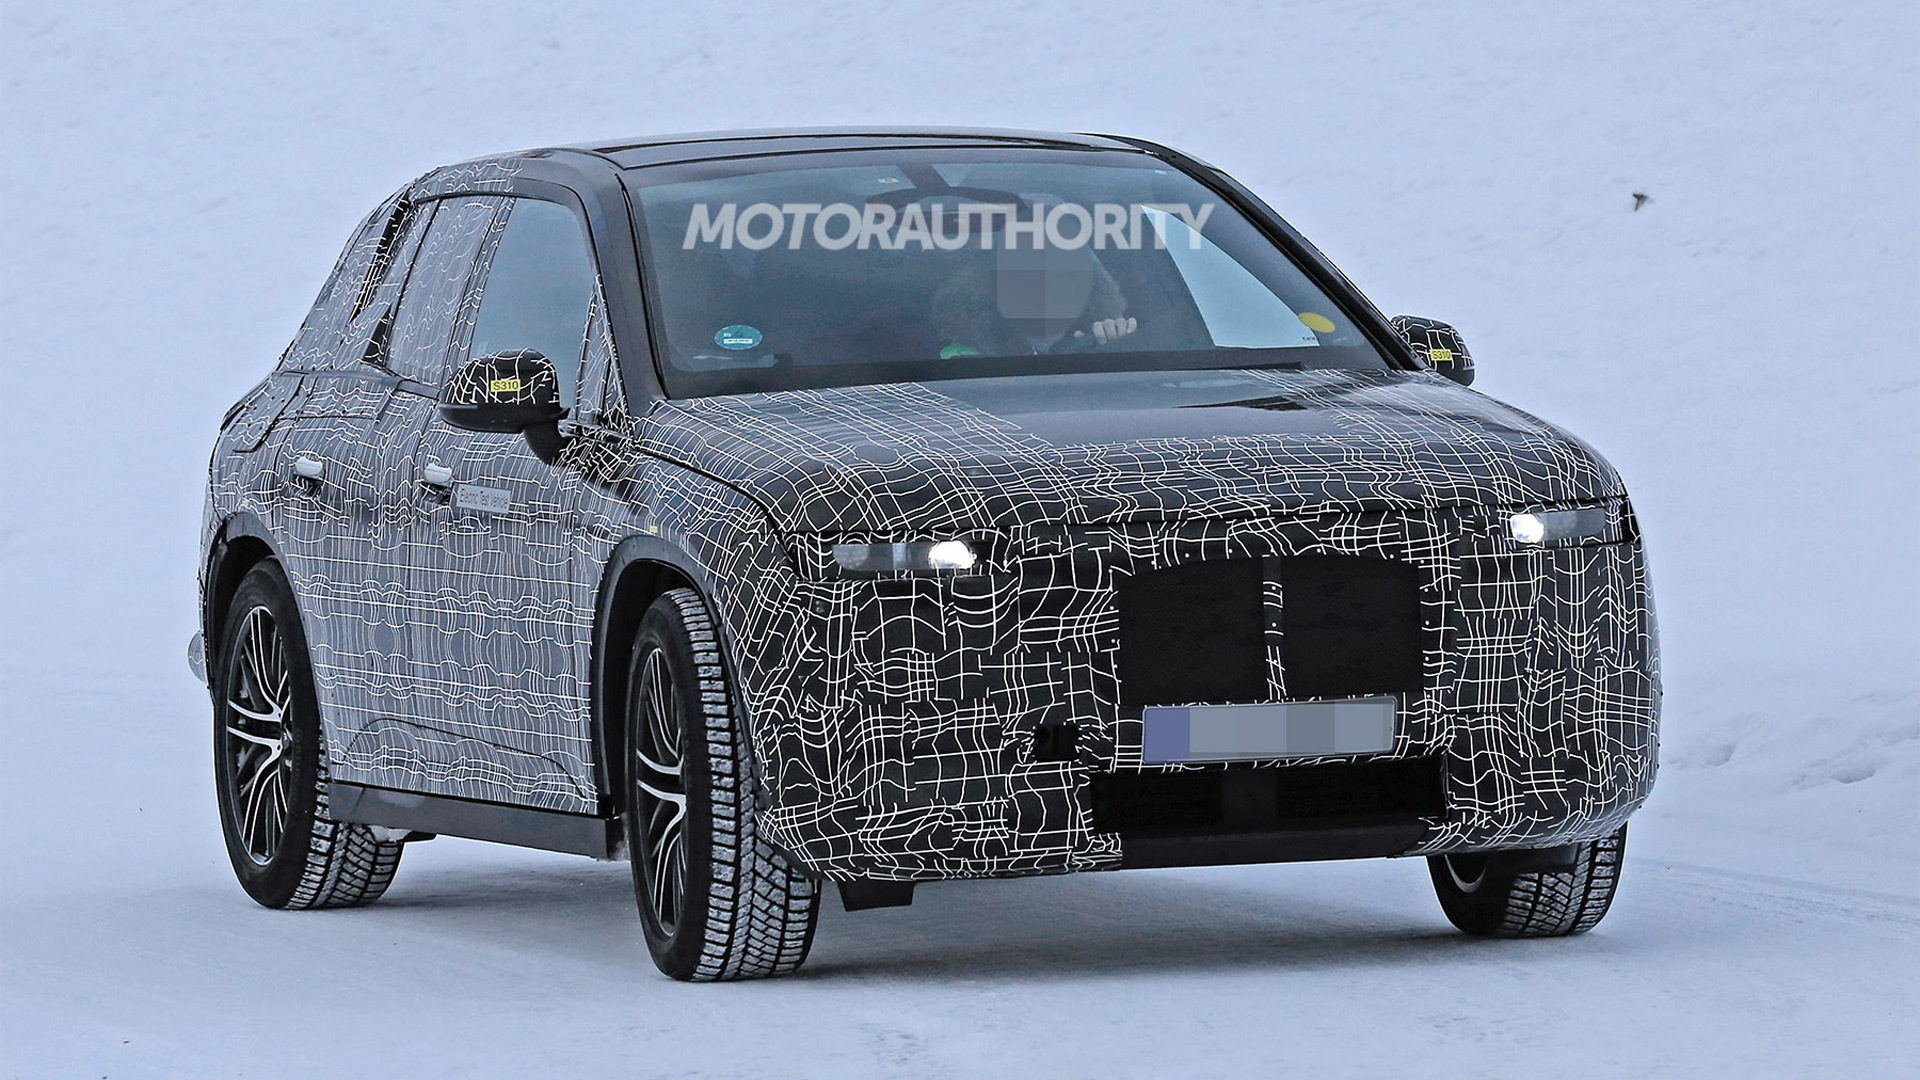 2022 BMW iNext spy shots - Image via S. Baldauf/SB-Medien